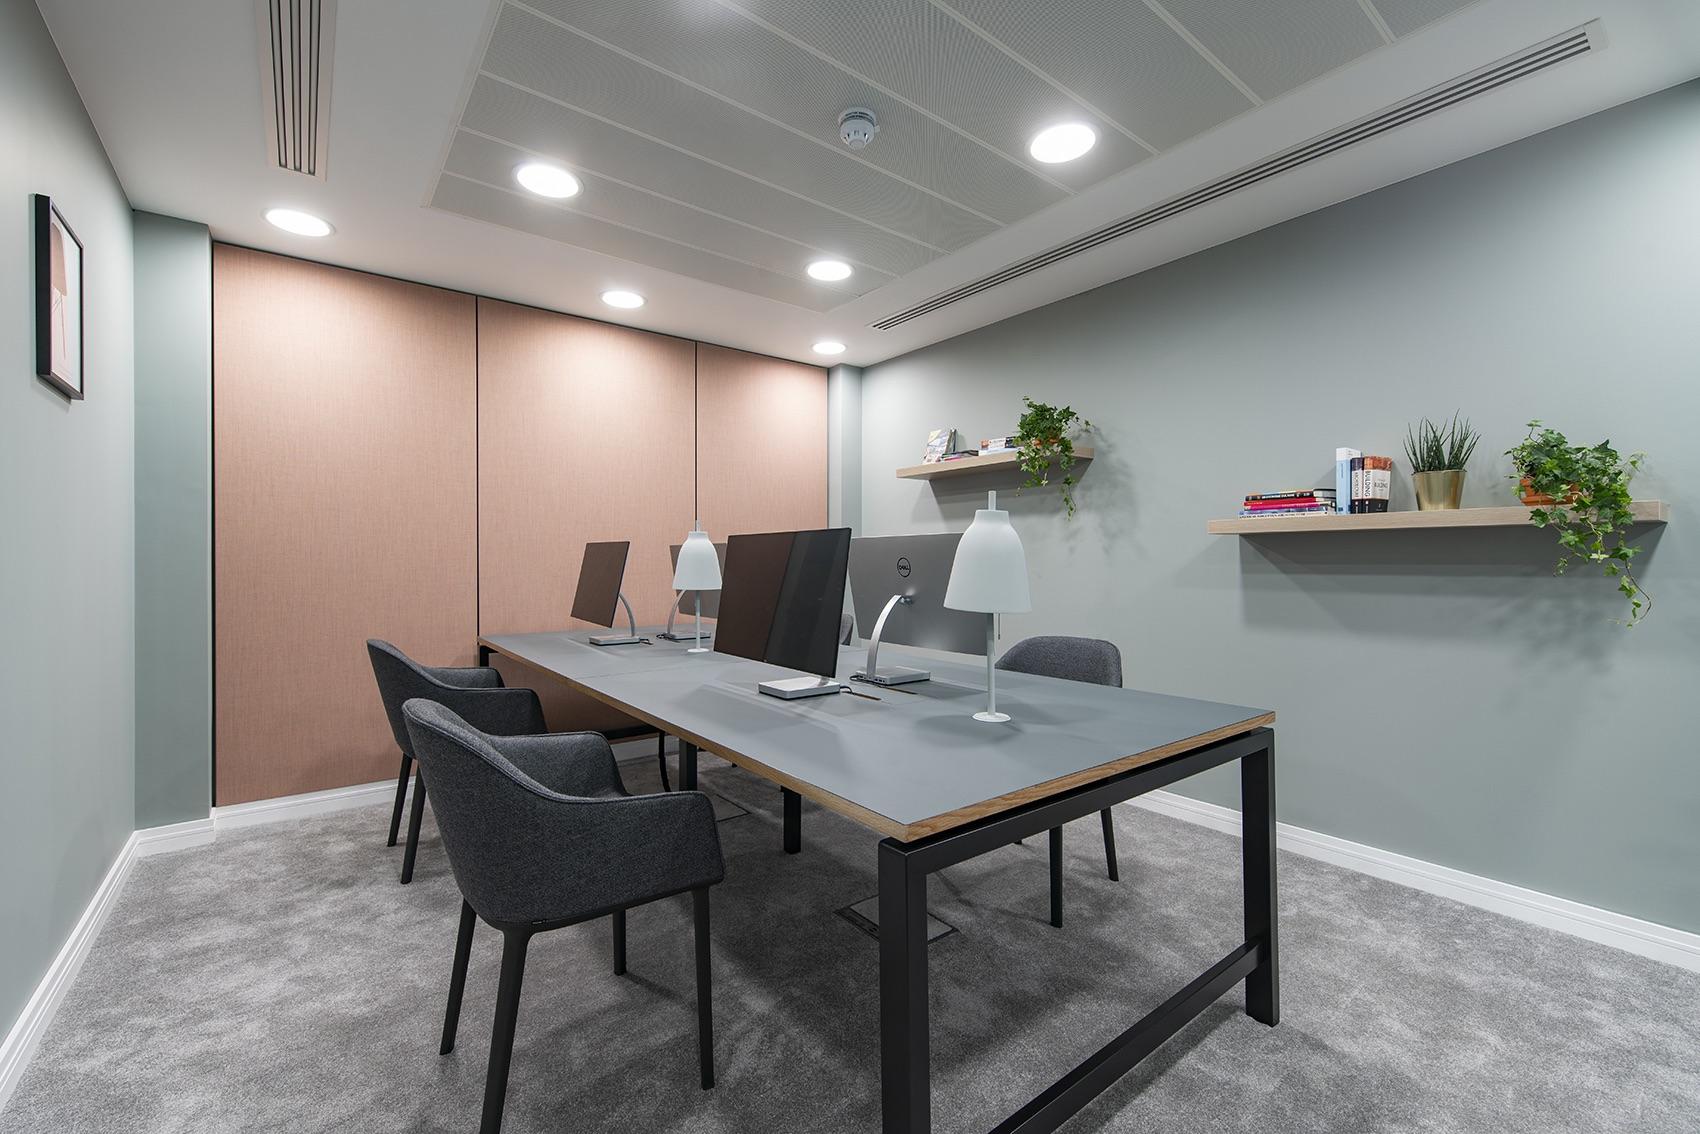 peldon-rose-new-office-london-9